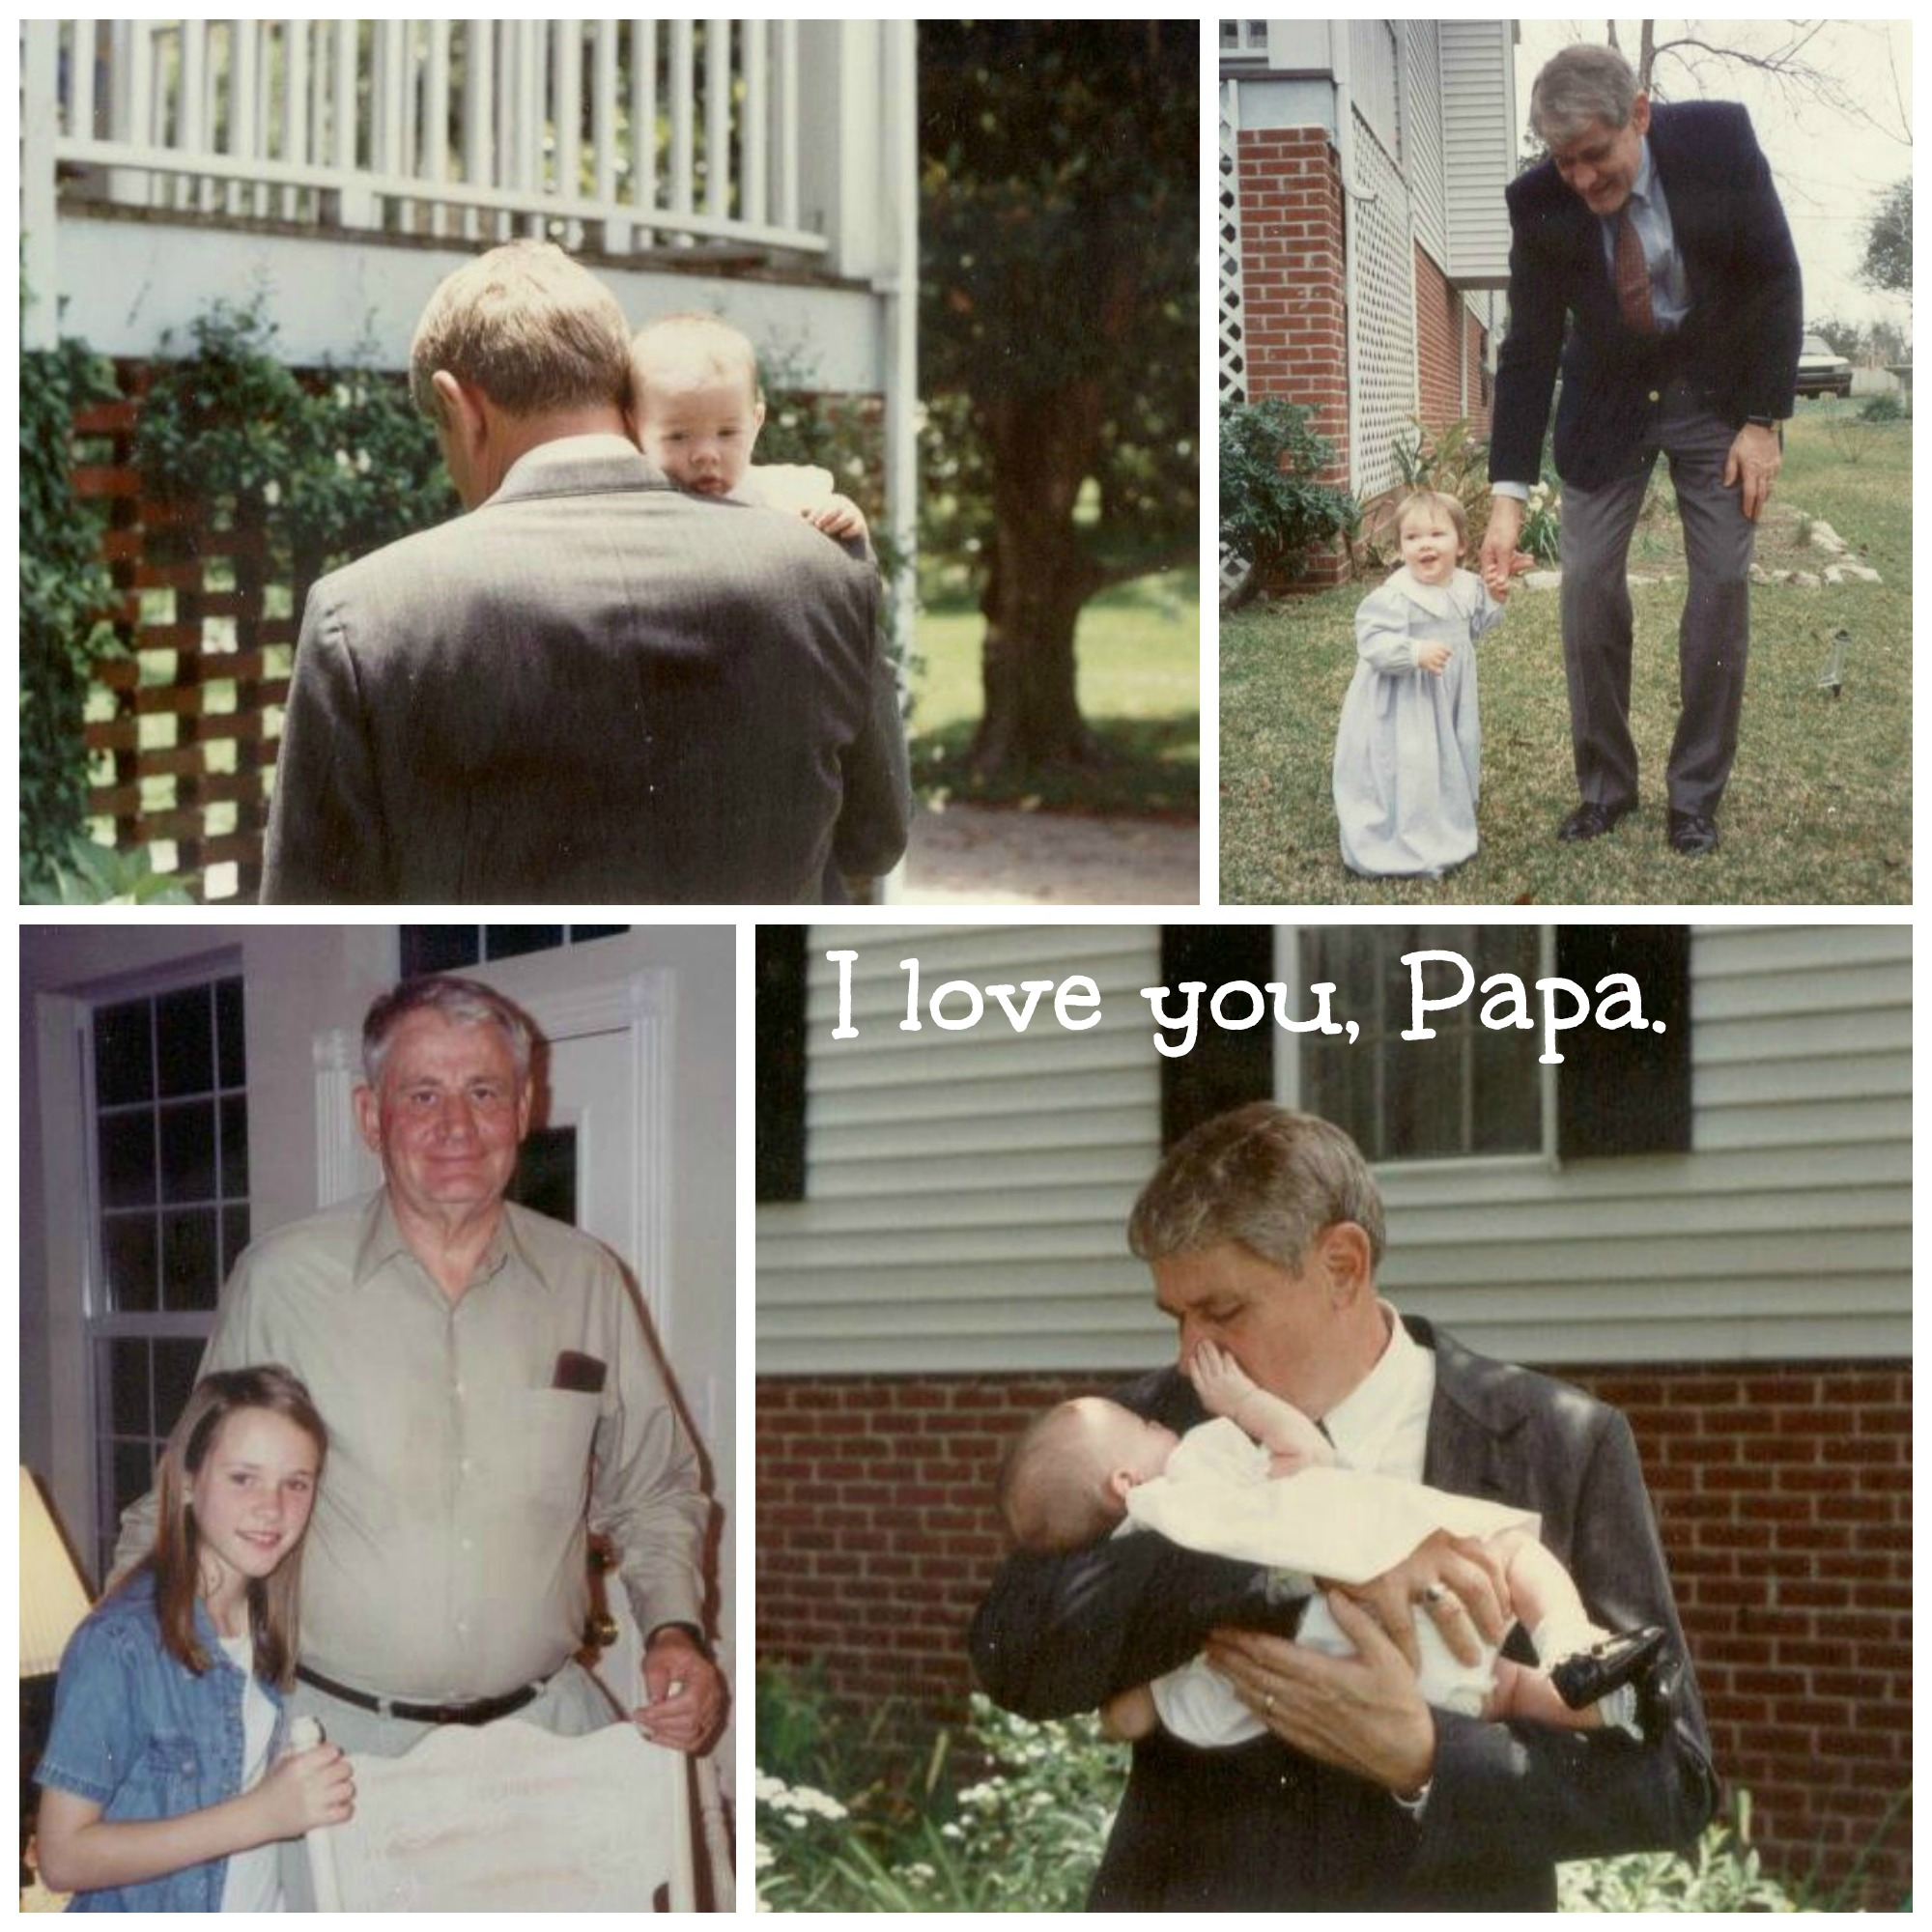 I Love You, Papa